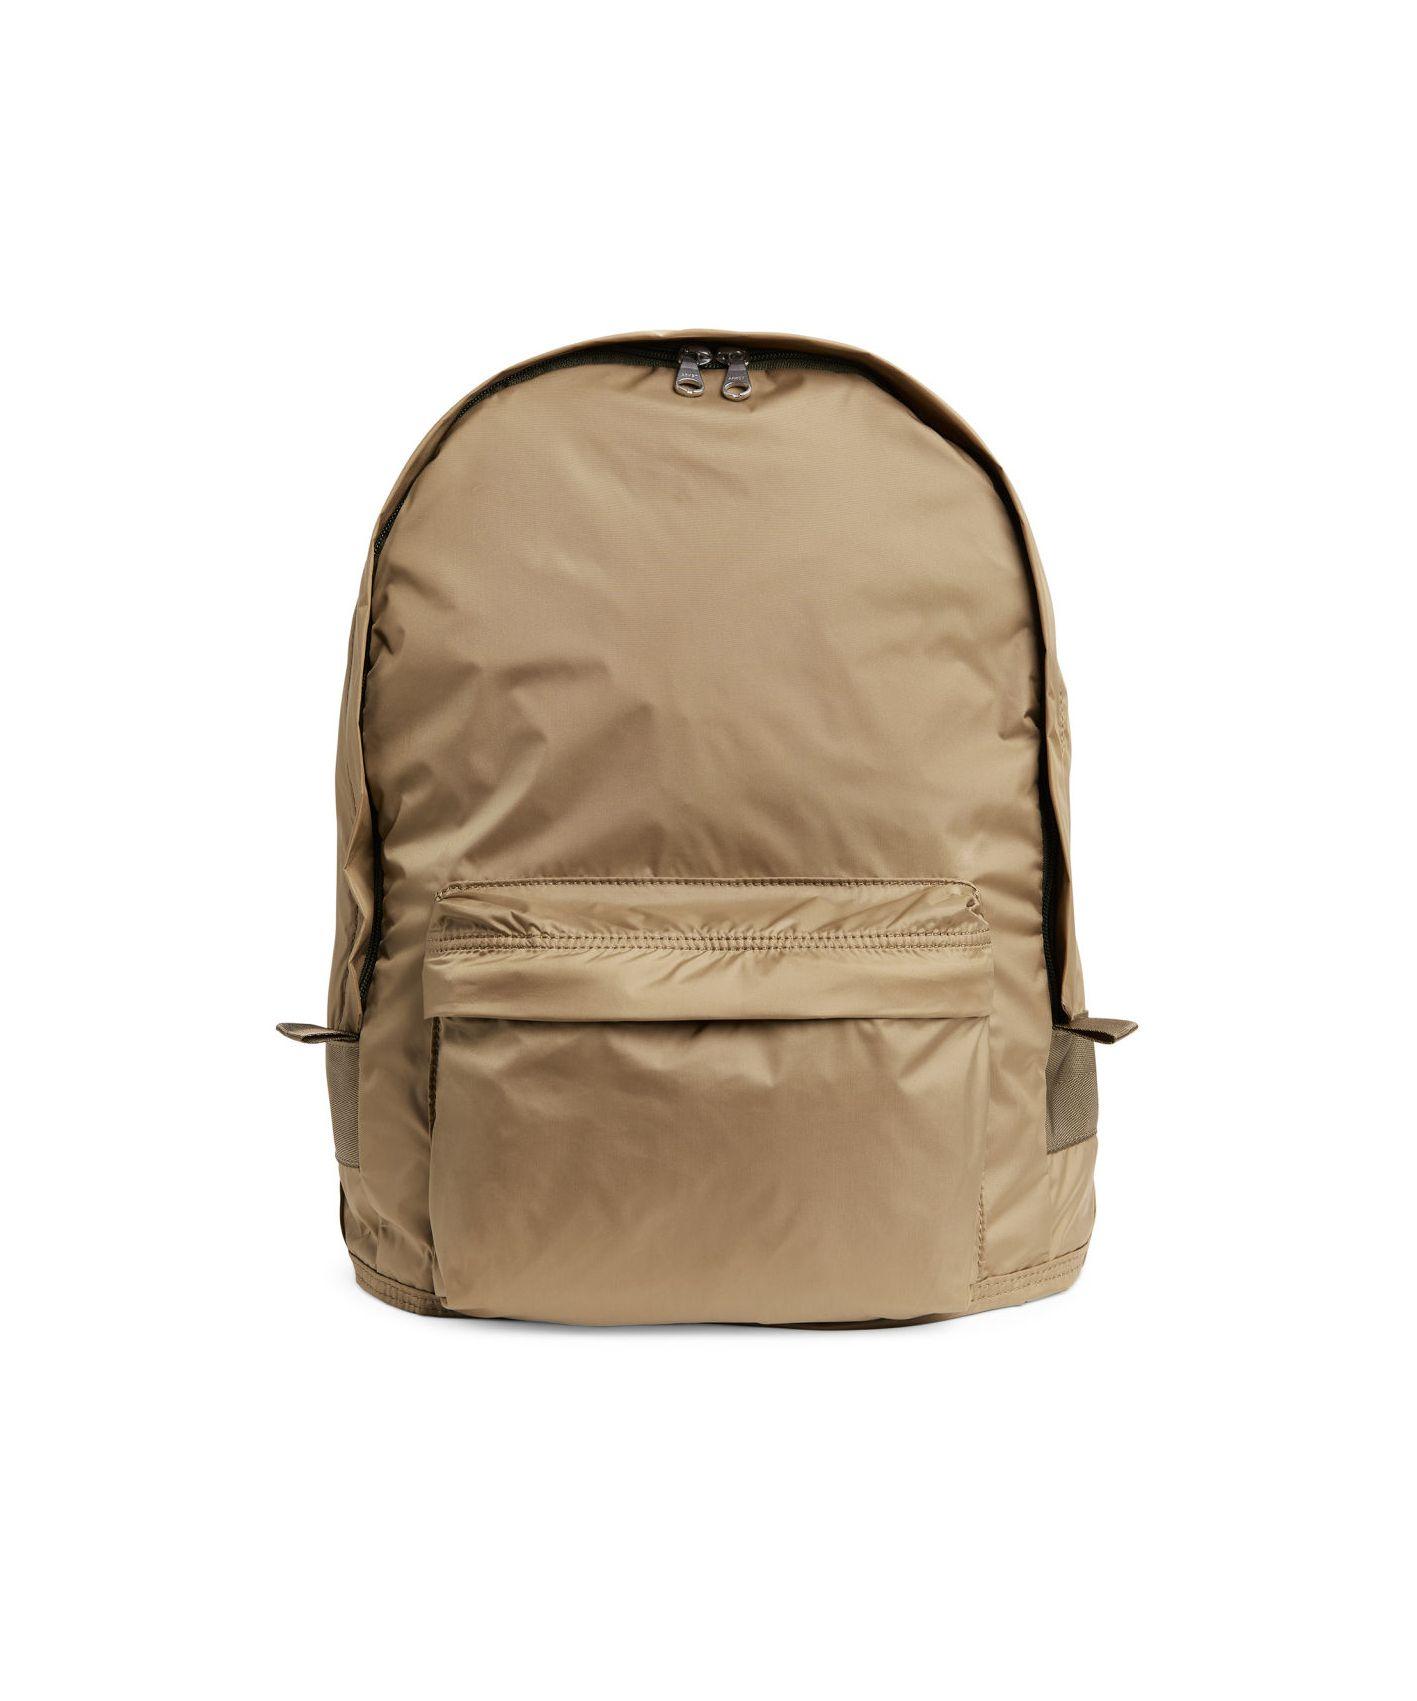 The Best Scandinavian Backpacks To Buy Now In 2020 Beautiful Backpacks Backpacks Perfect Travel Bag